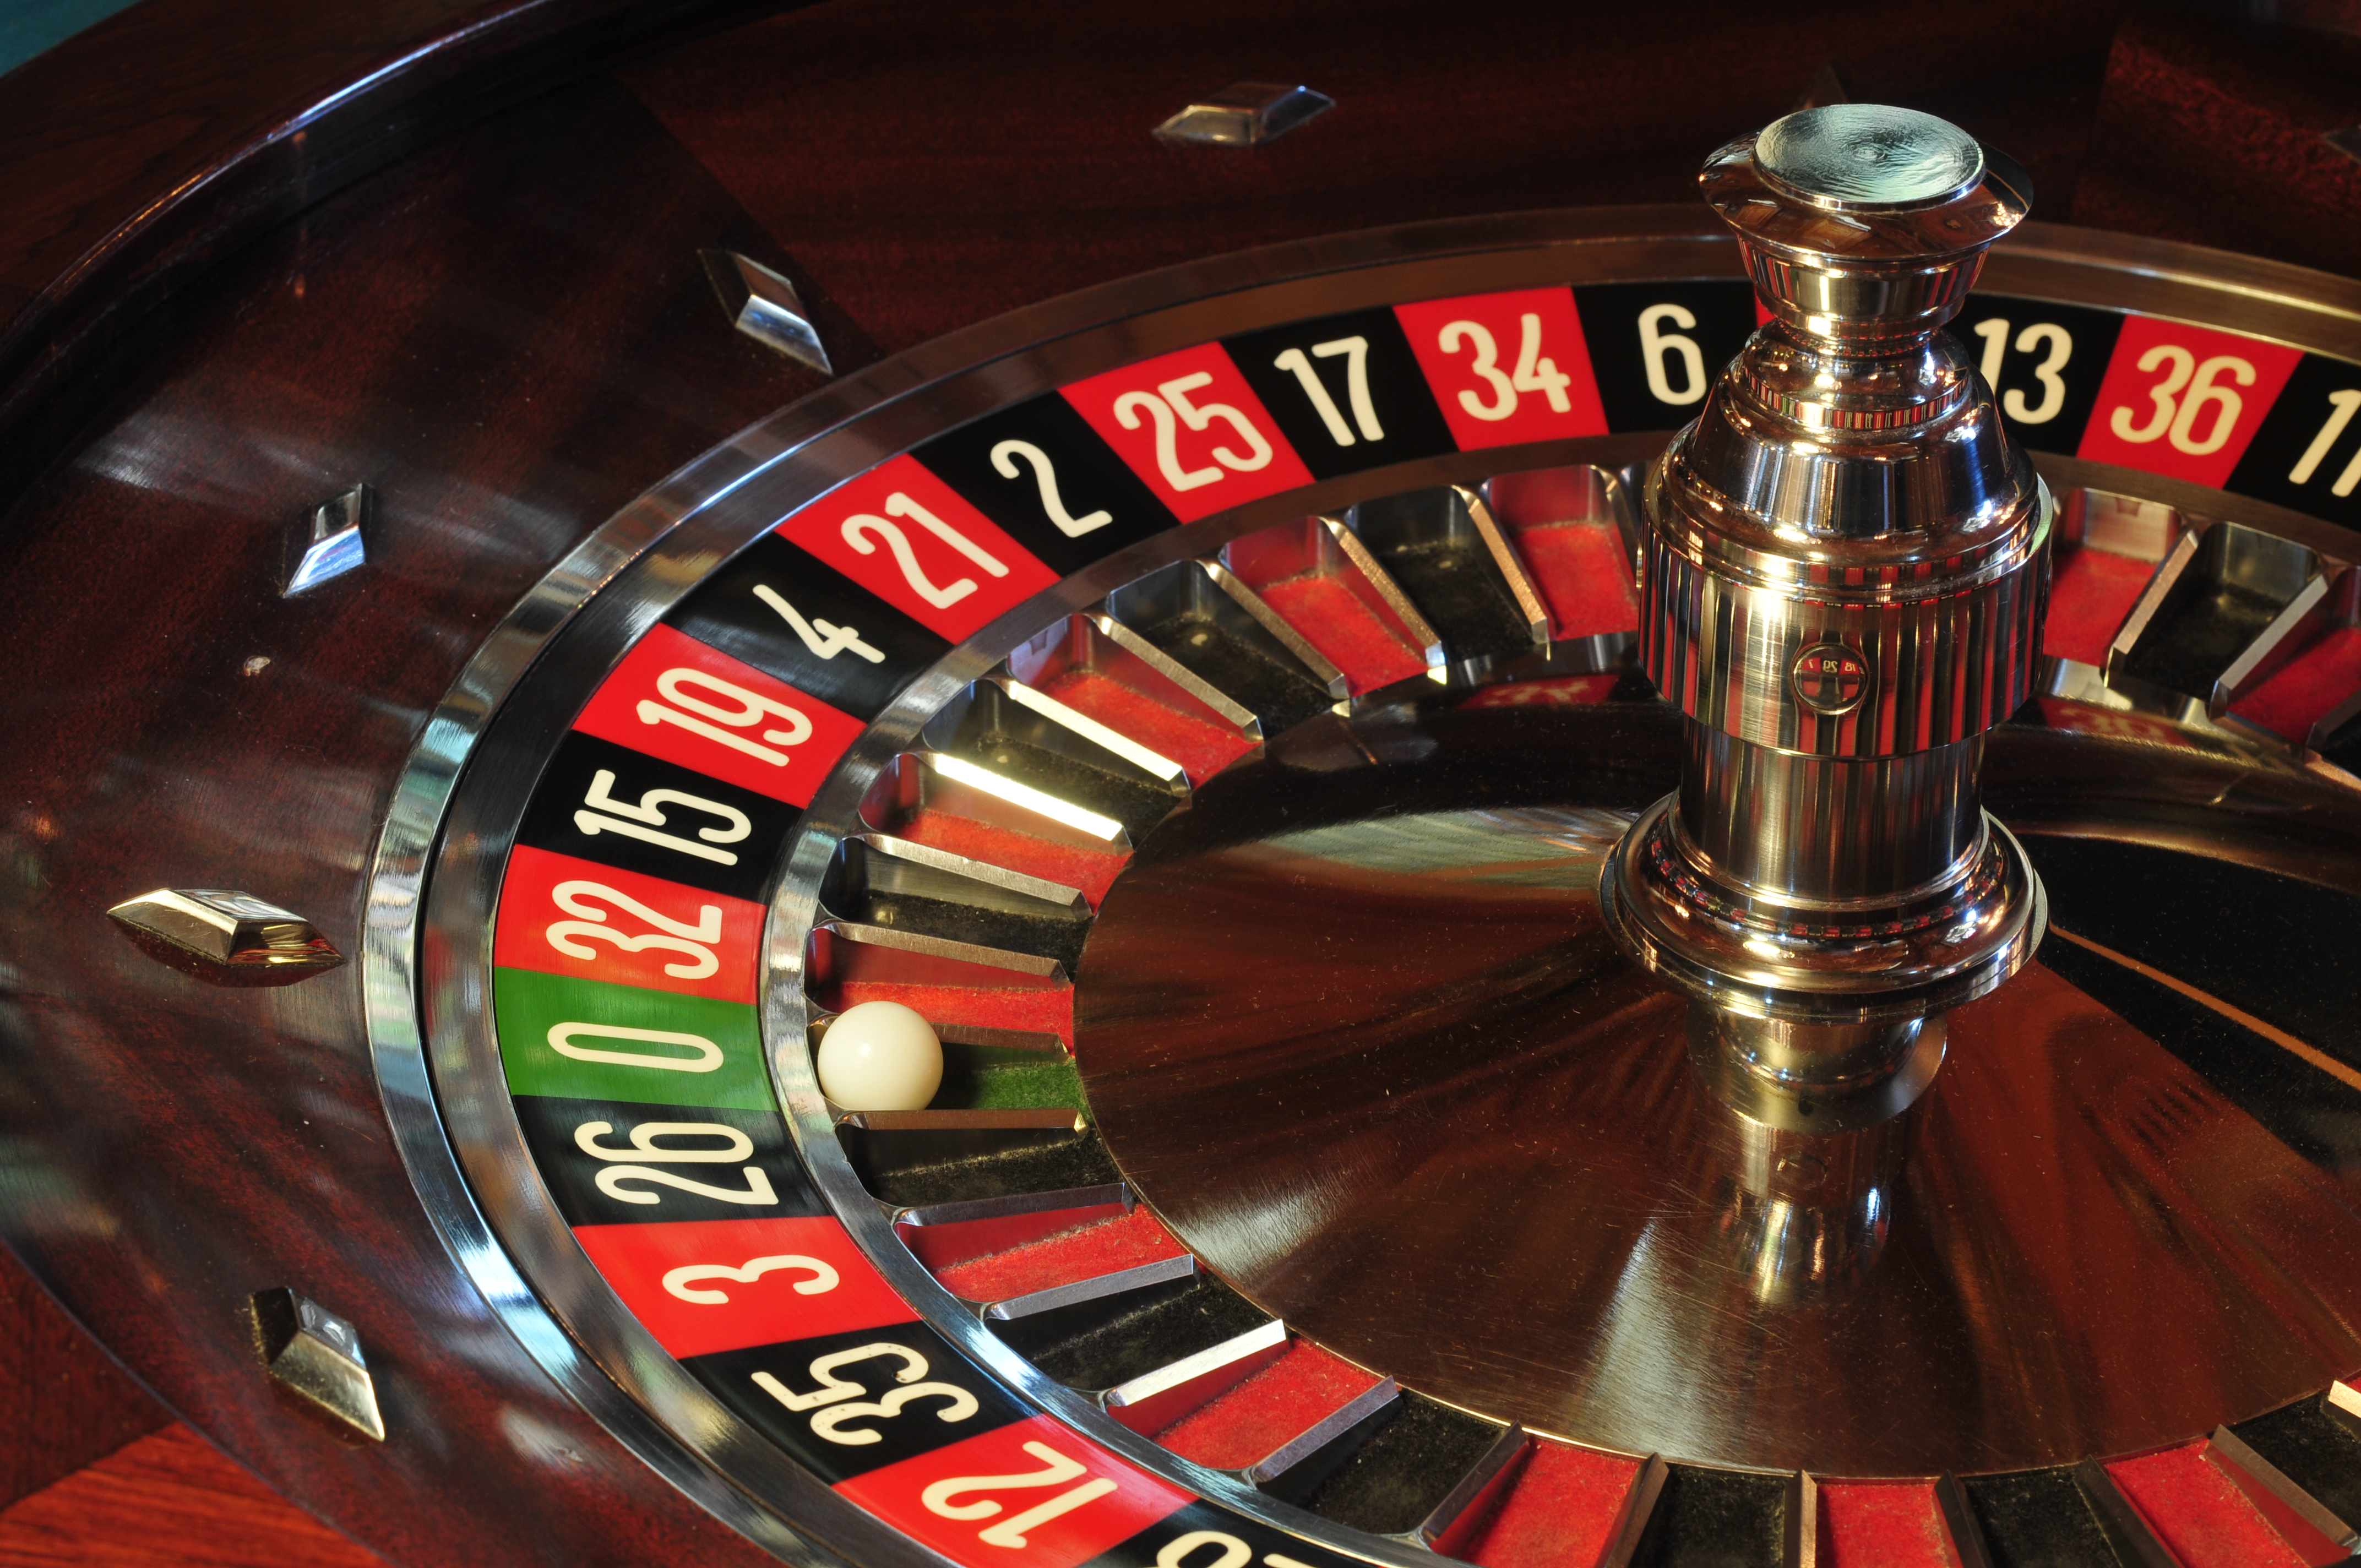 Roulette Wheel courtesy Wikpedia